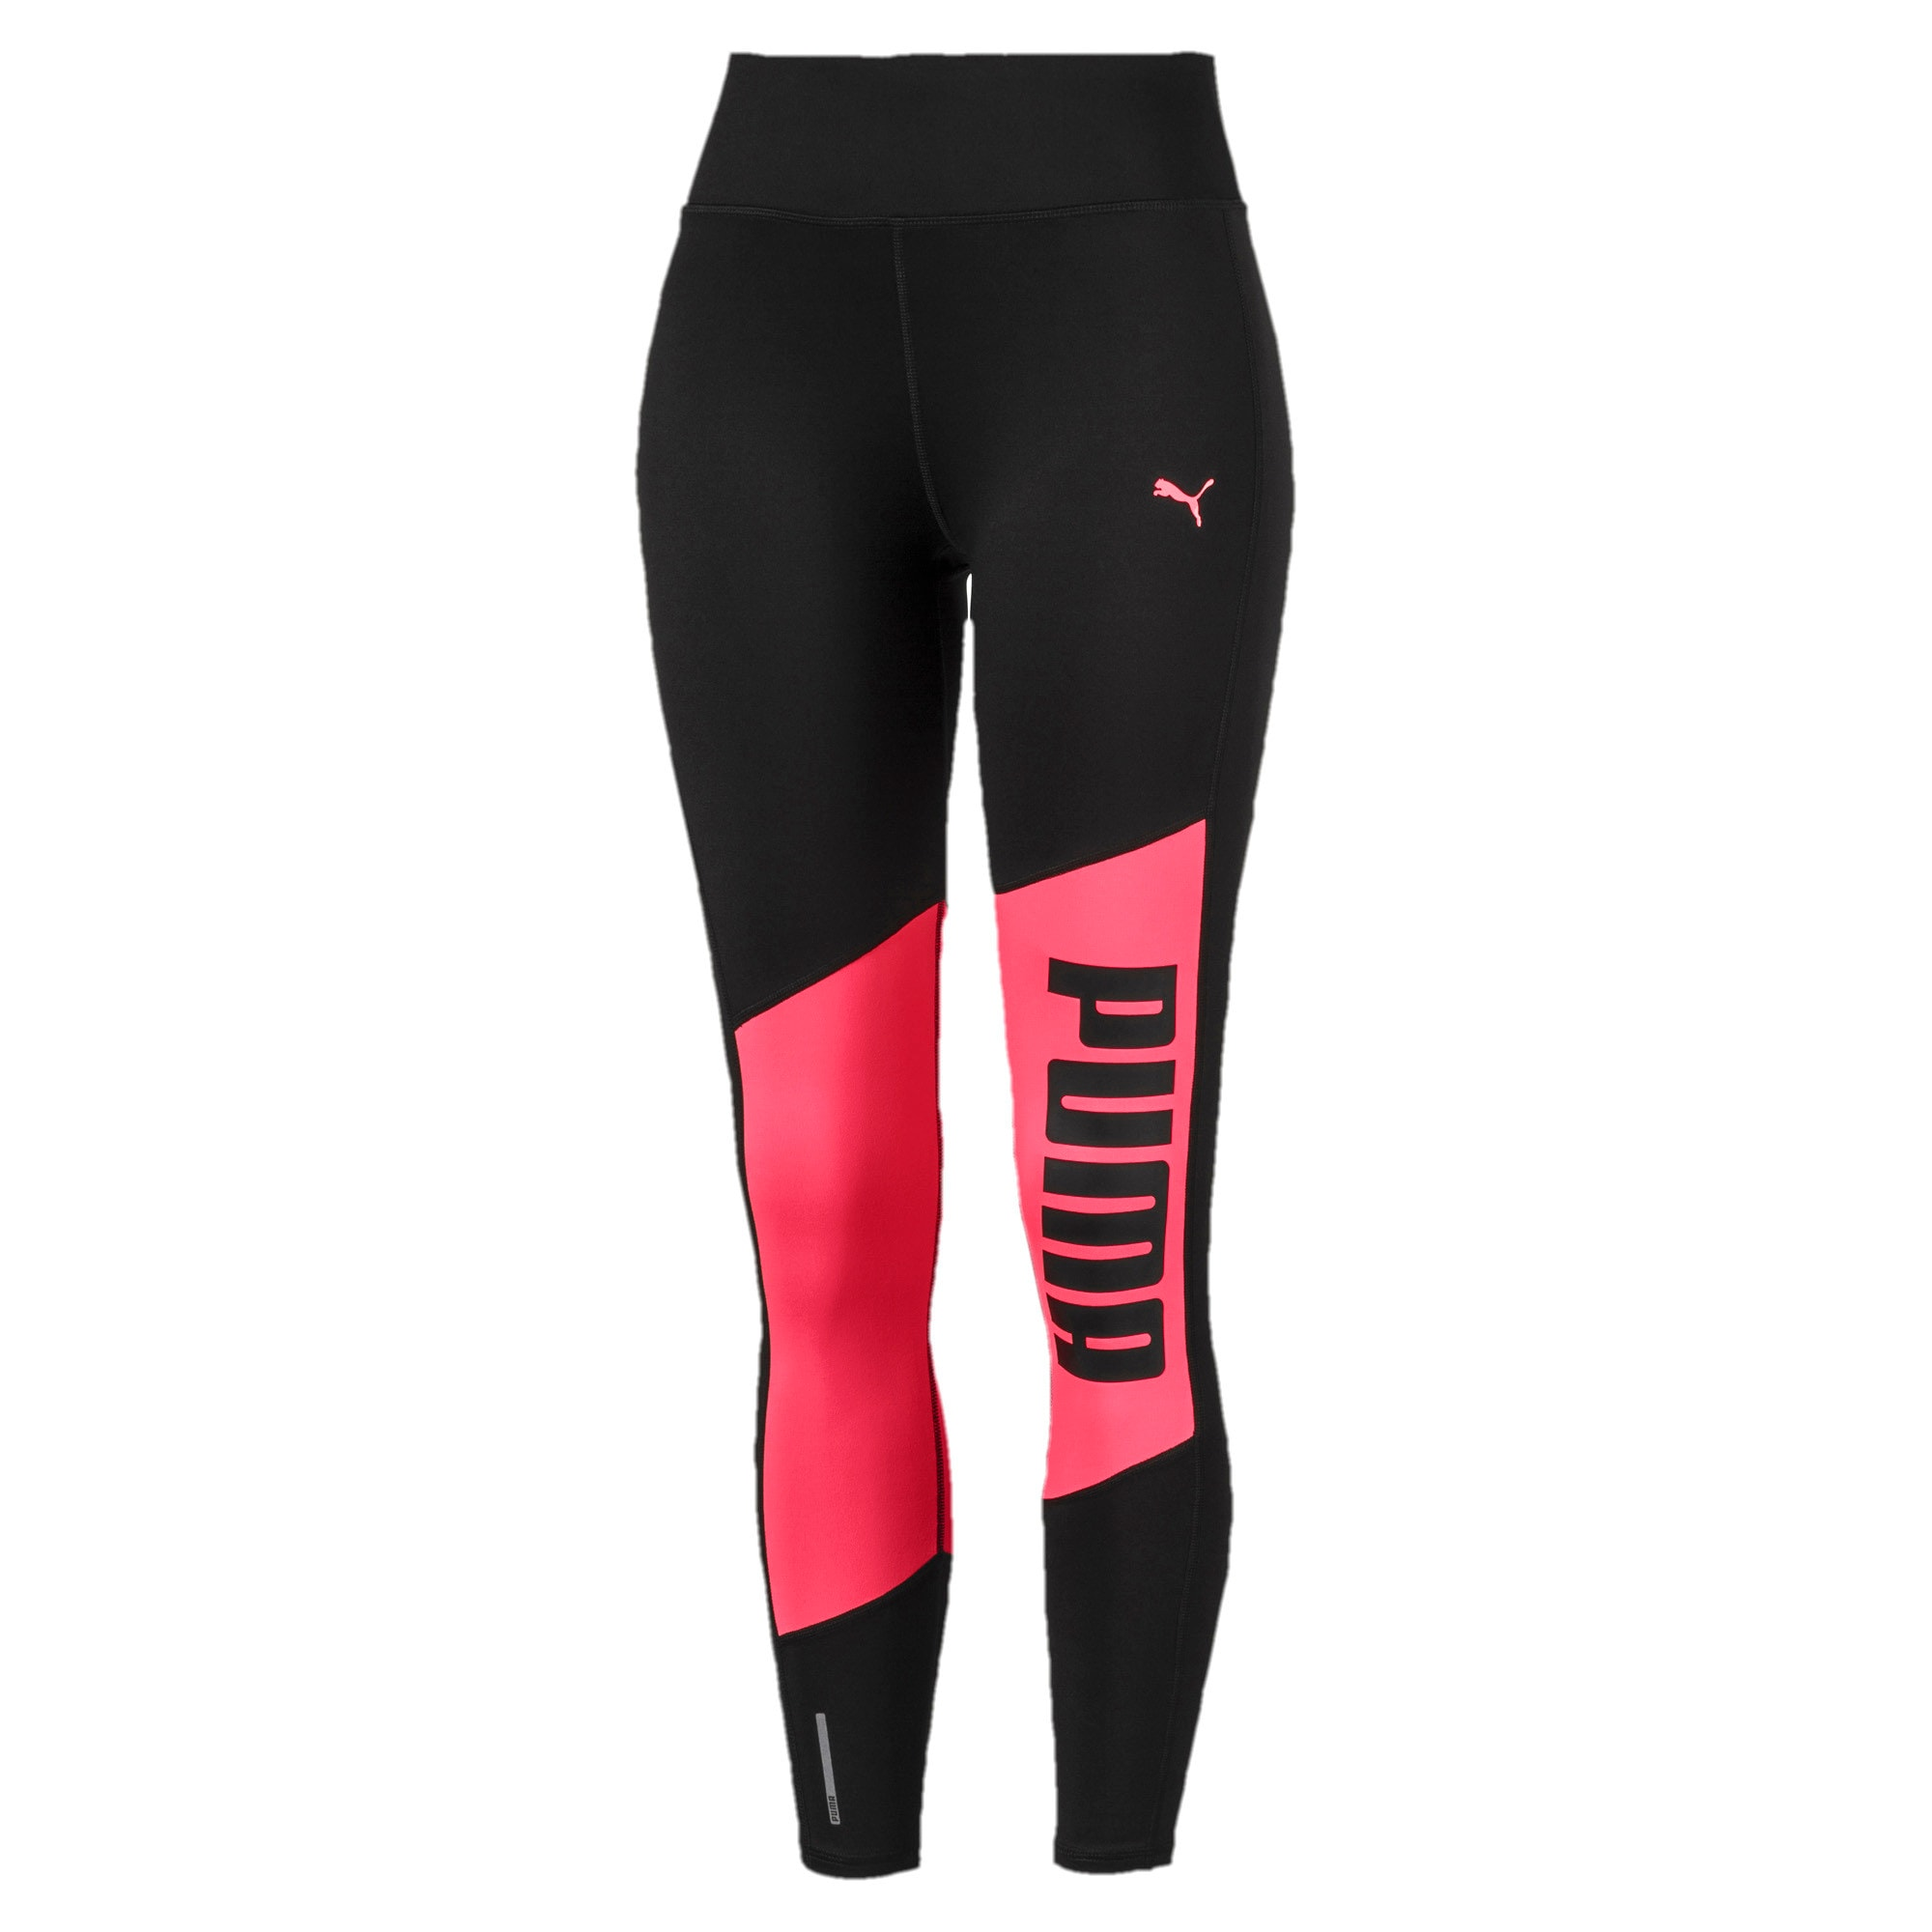 Thumbnail 4 of Logo 7/8 Graphic Women's Training Leggings, Puma Black-Pink Alert, medium